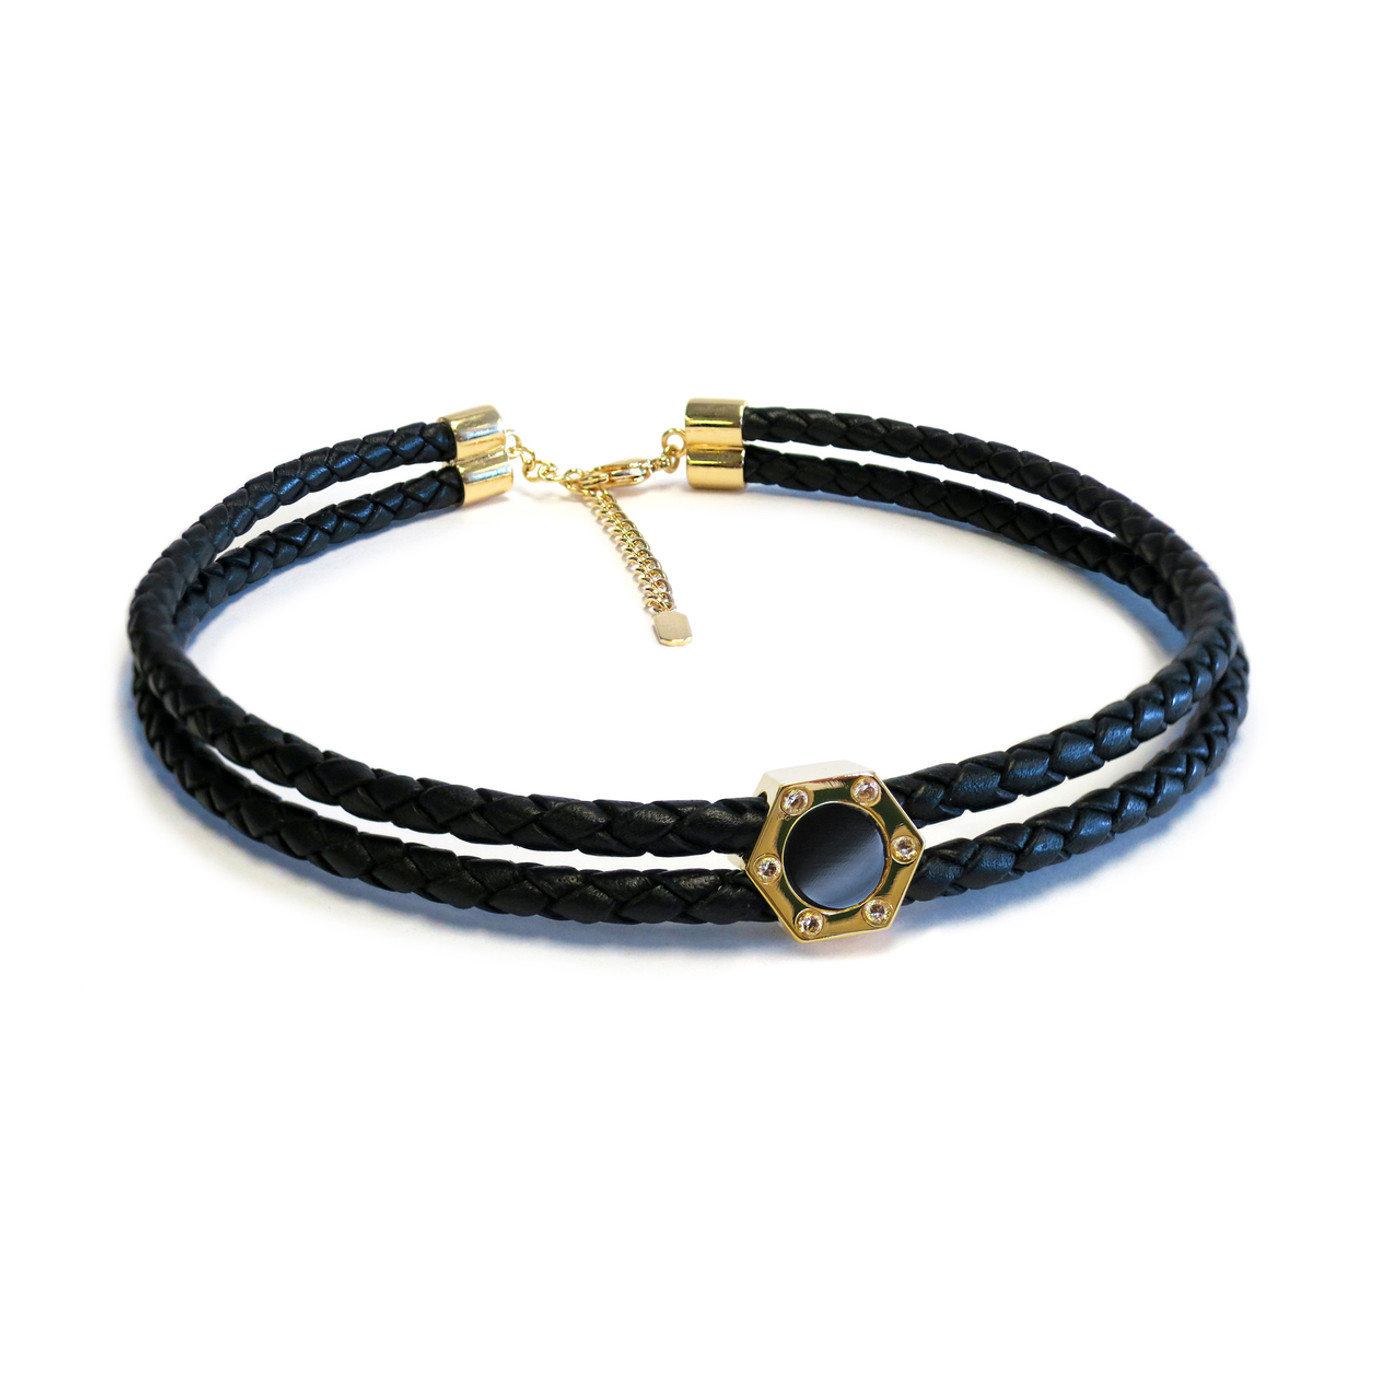 Monte Carlo Onyx Gold Leather Choker